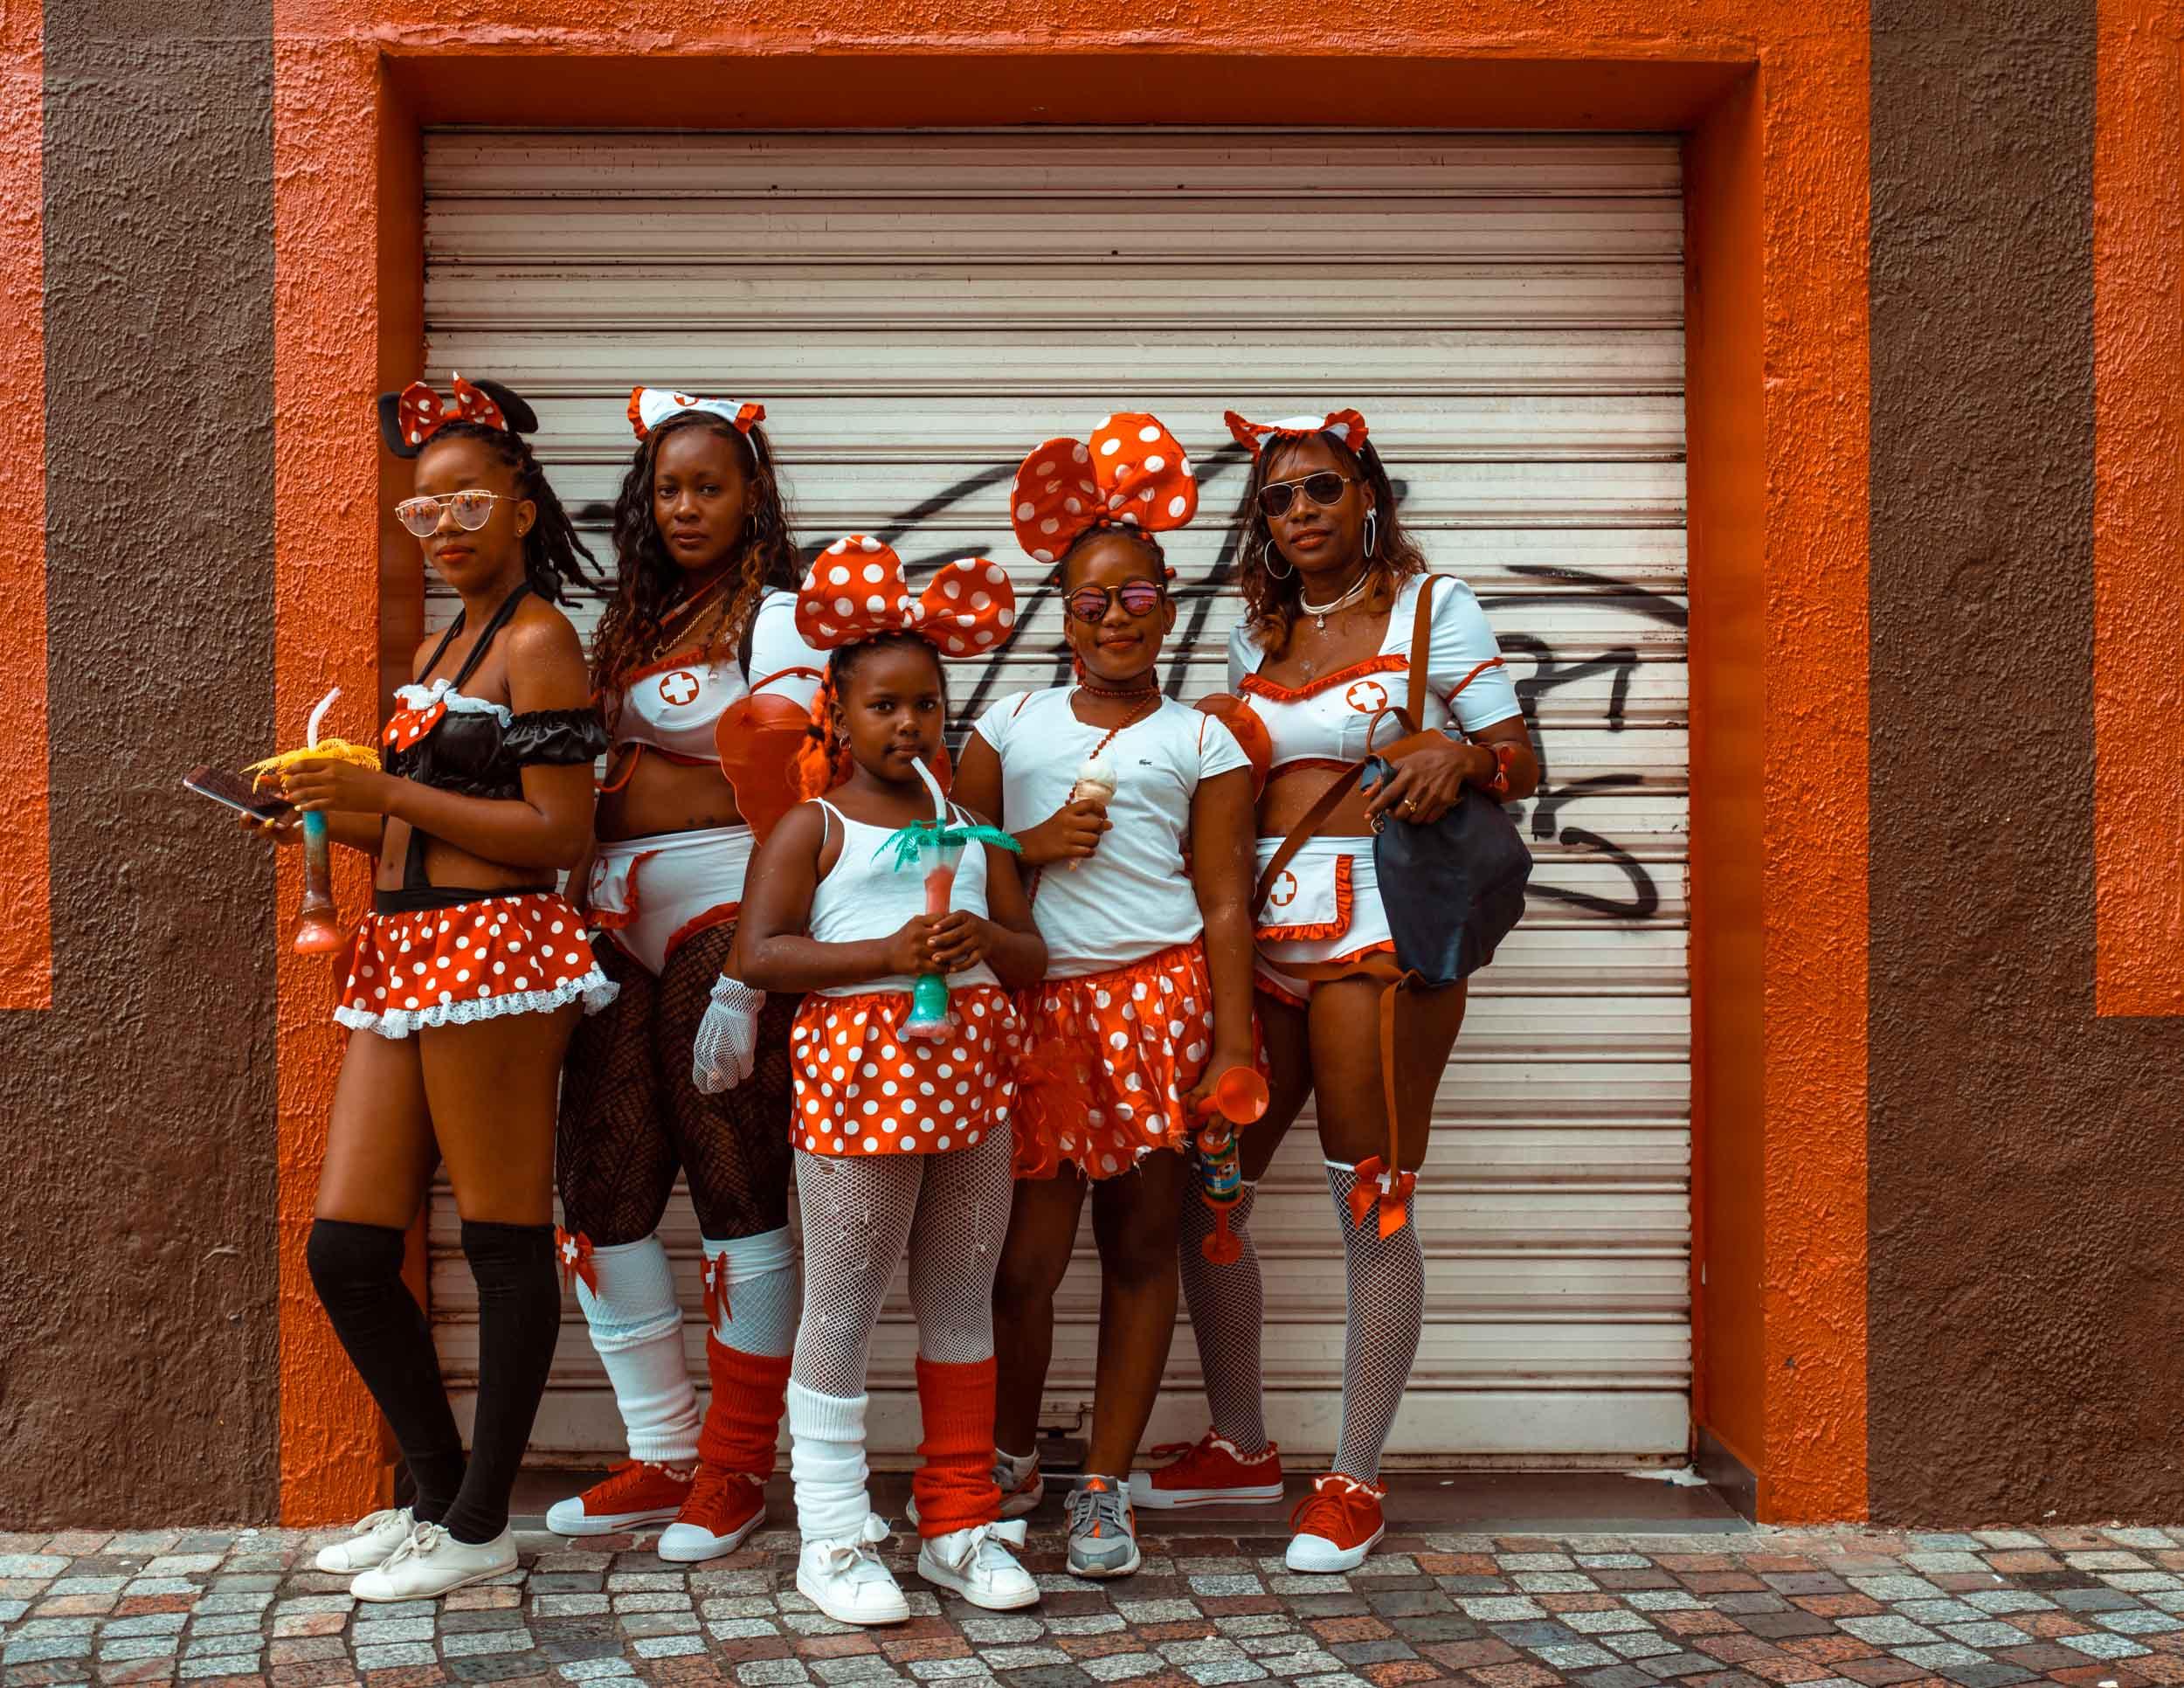 180213_SK_Martinique-22.jpg